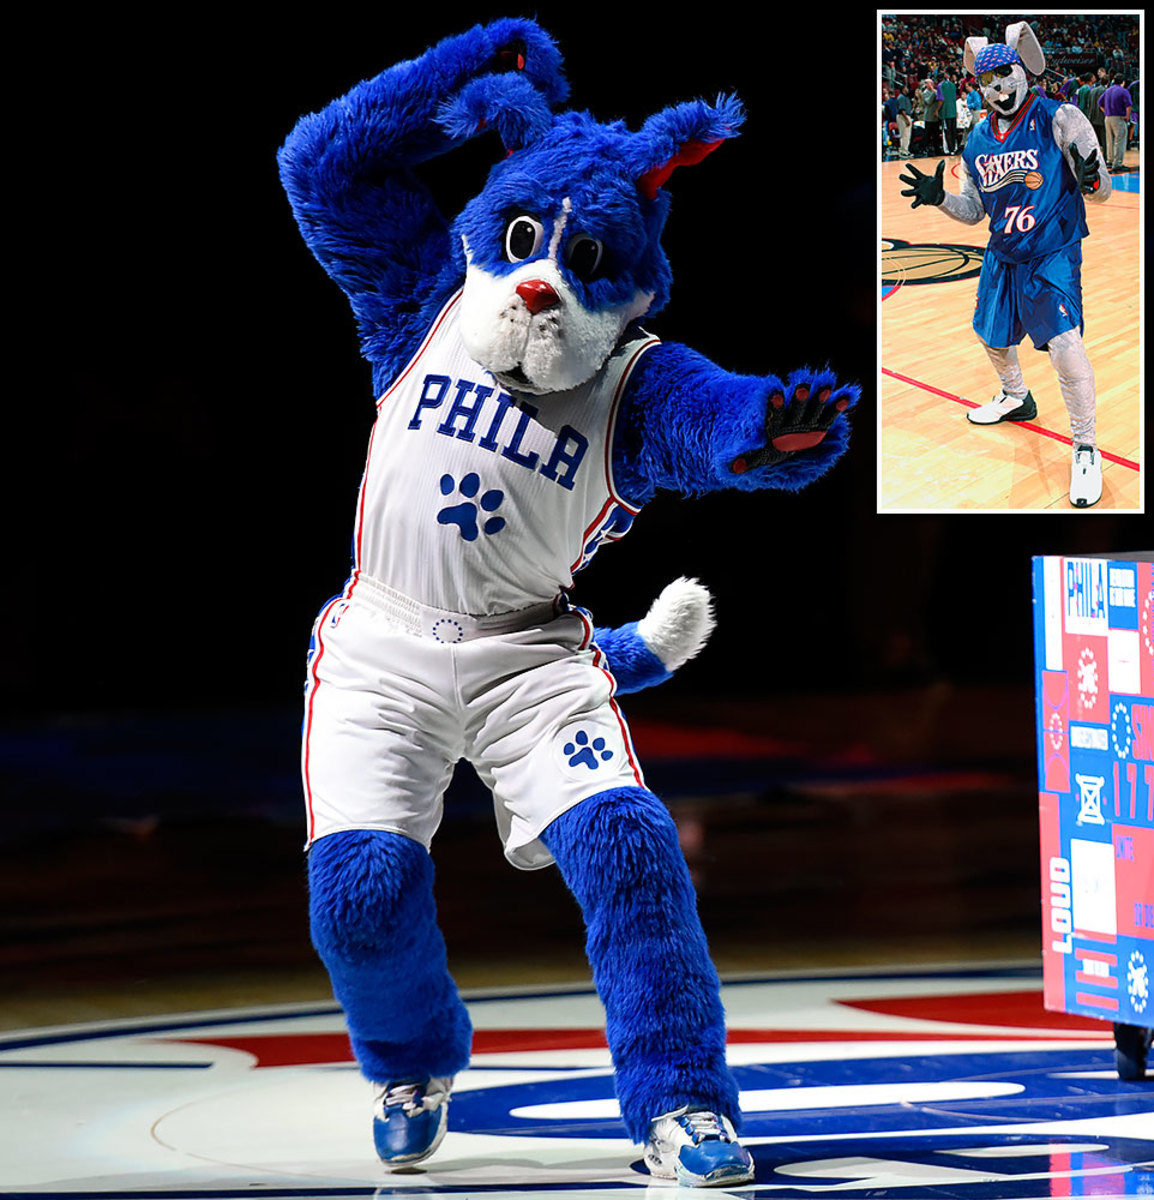 Philadlephia-76ers-mascot-Franklin-inset-Hip-Hop.jpg